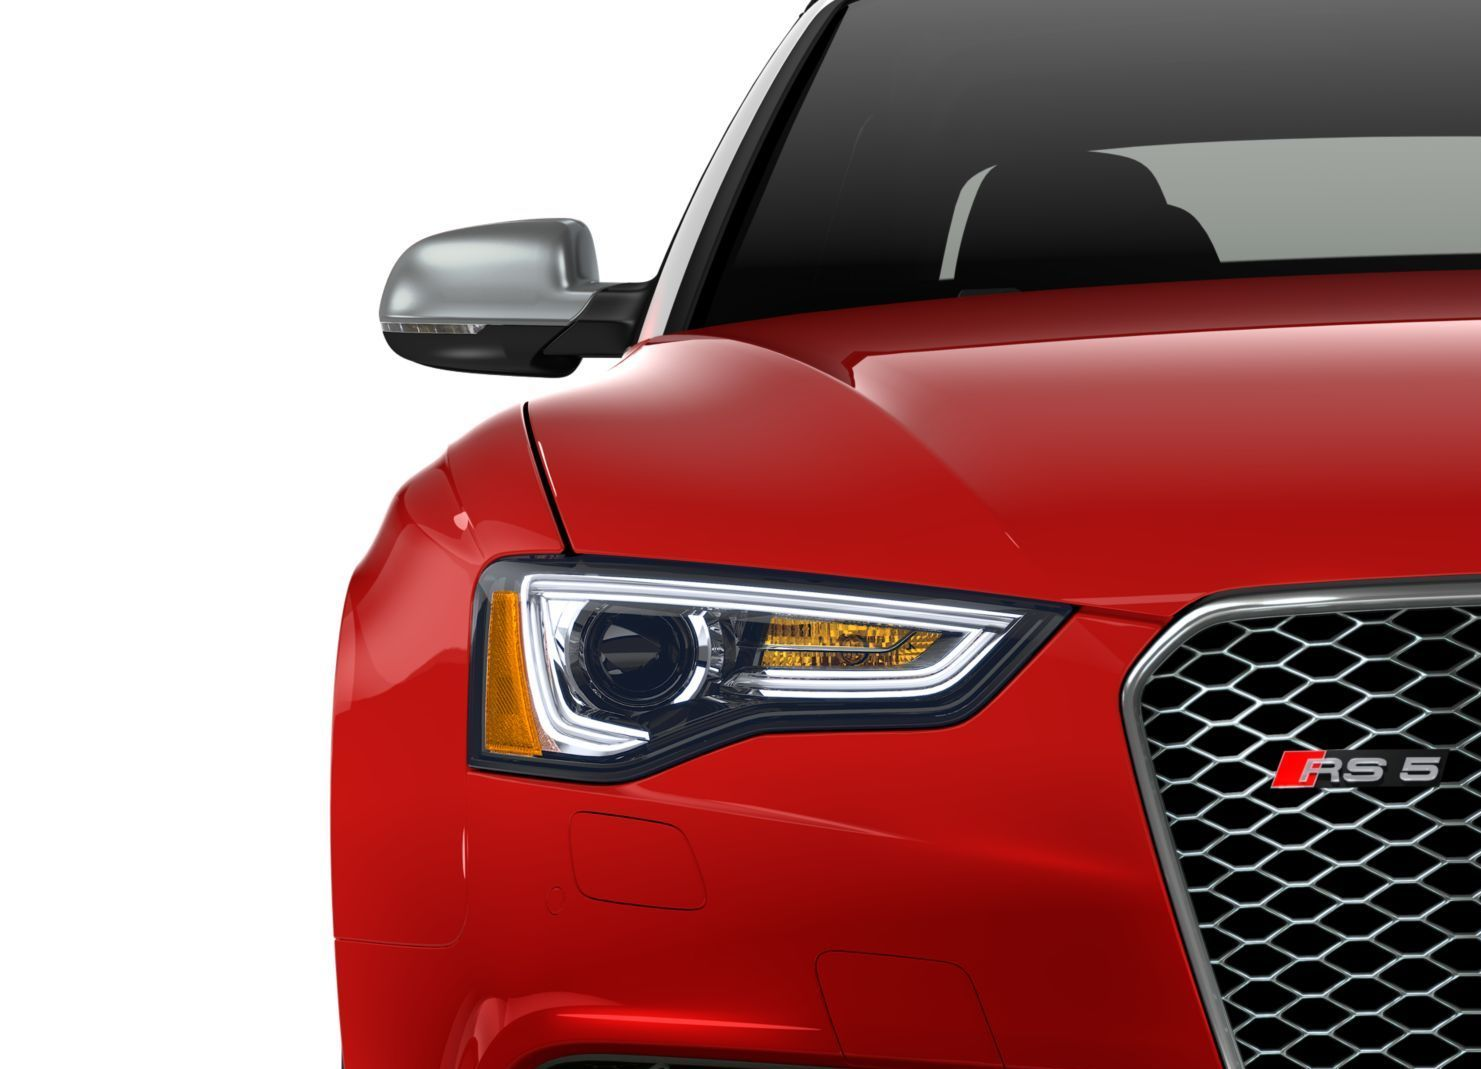 2014 Audi RS5 Cabriolet Buyers Guide - Black Optics vs Matte Aluminum Optics 52